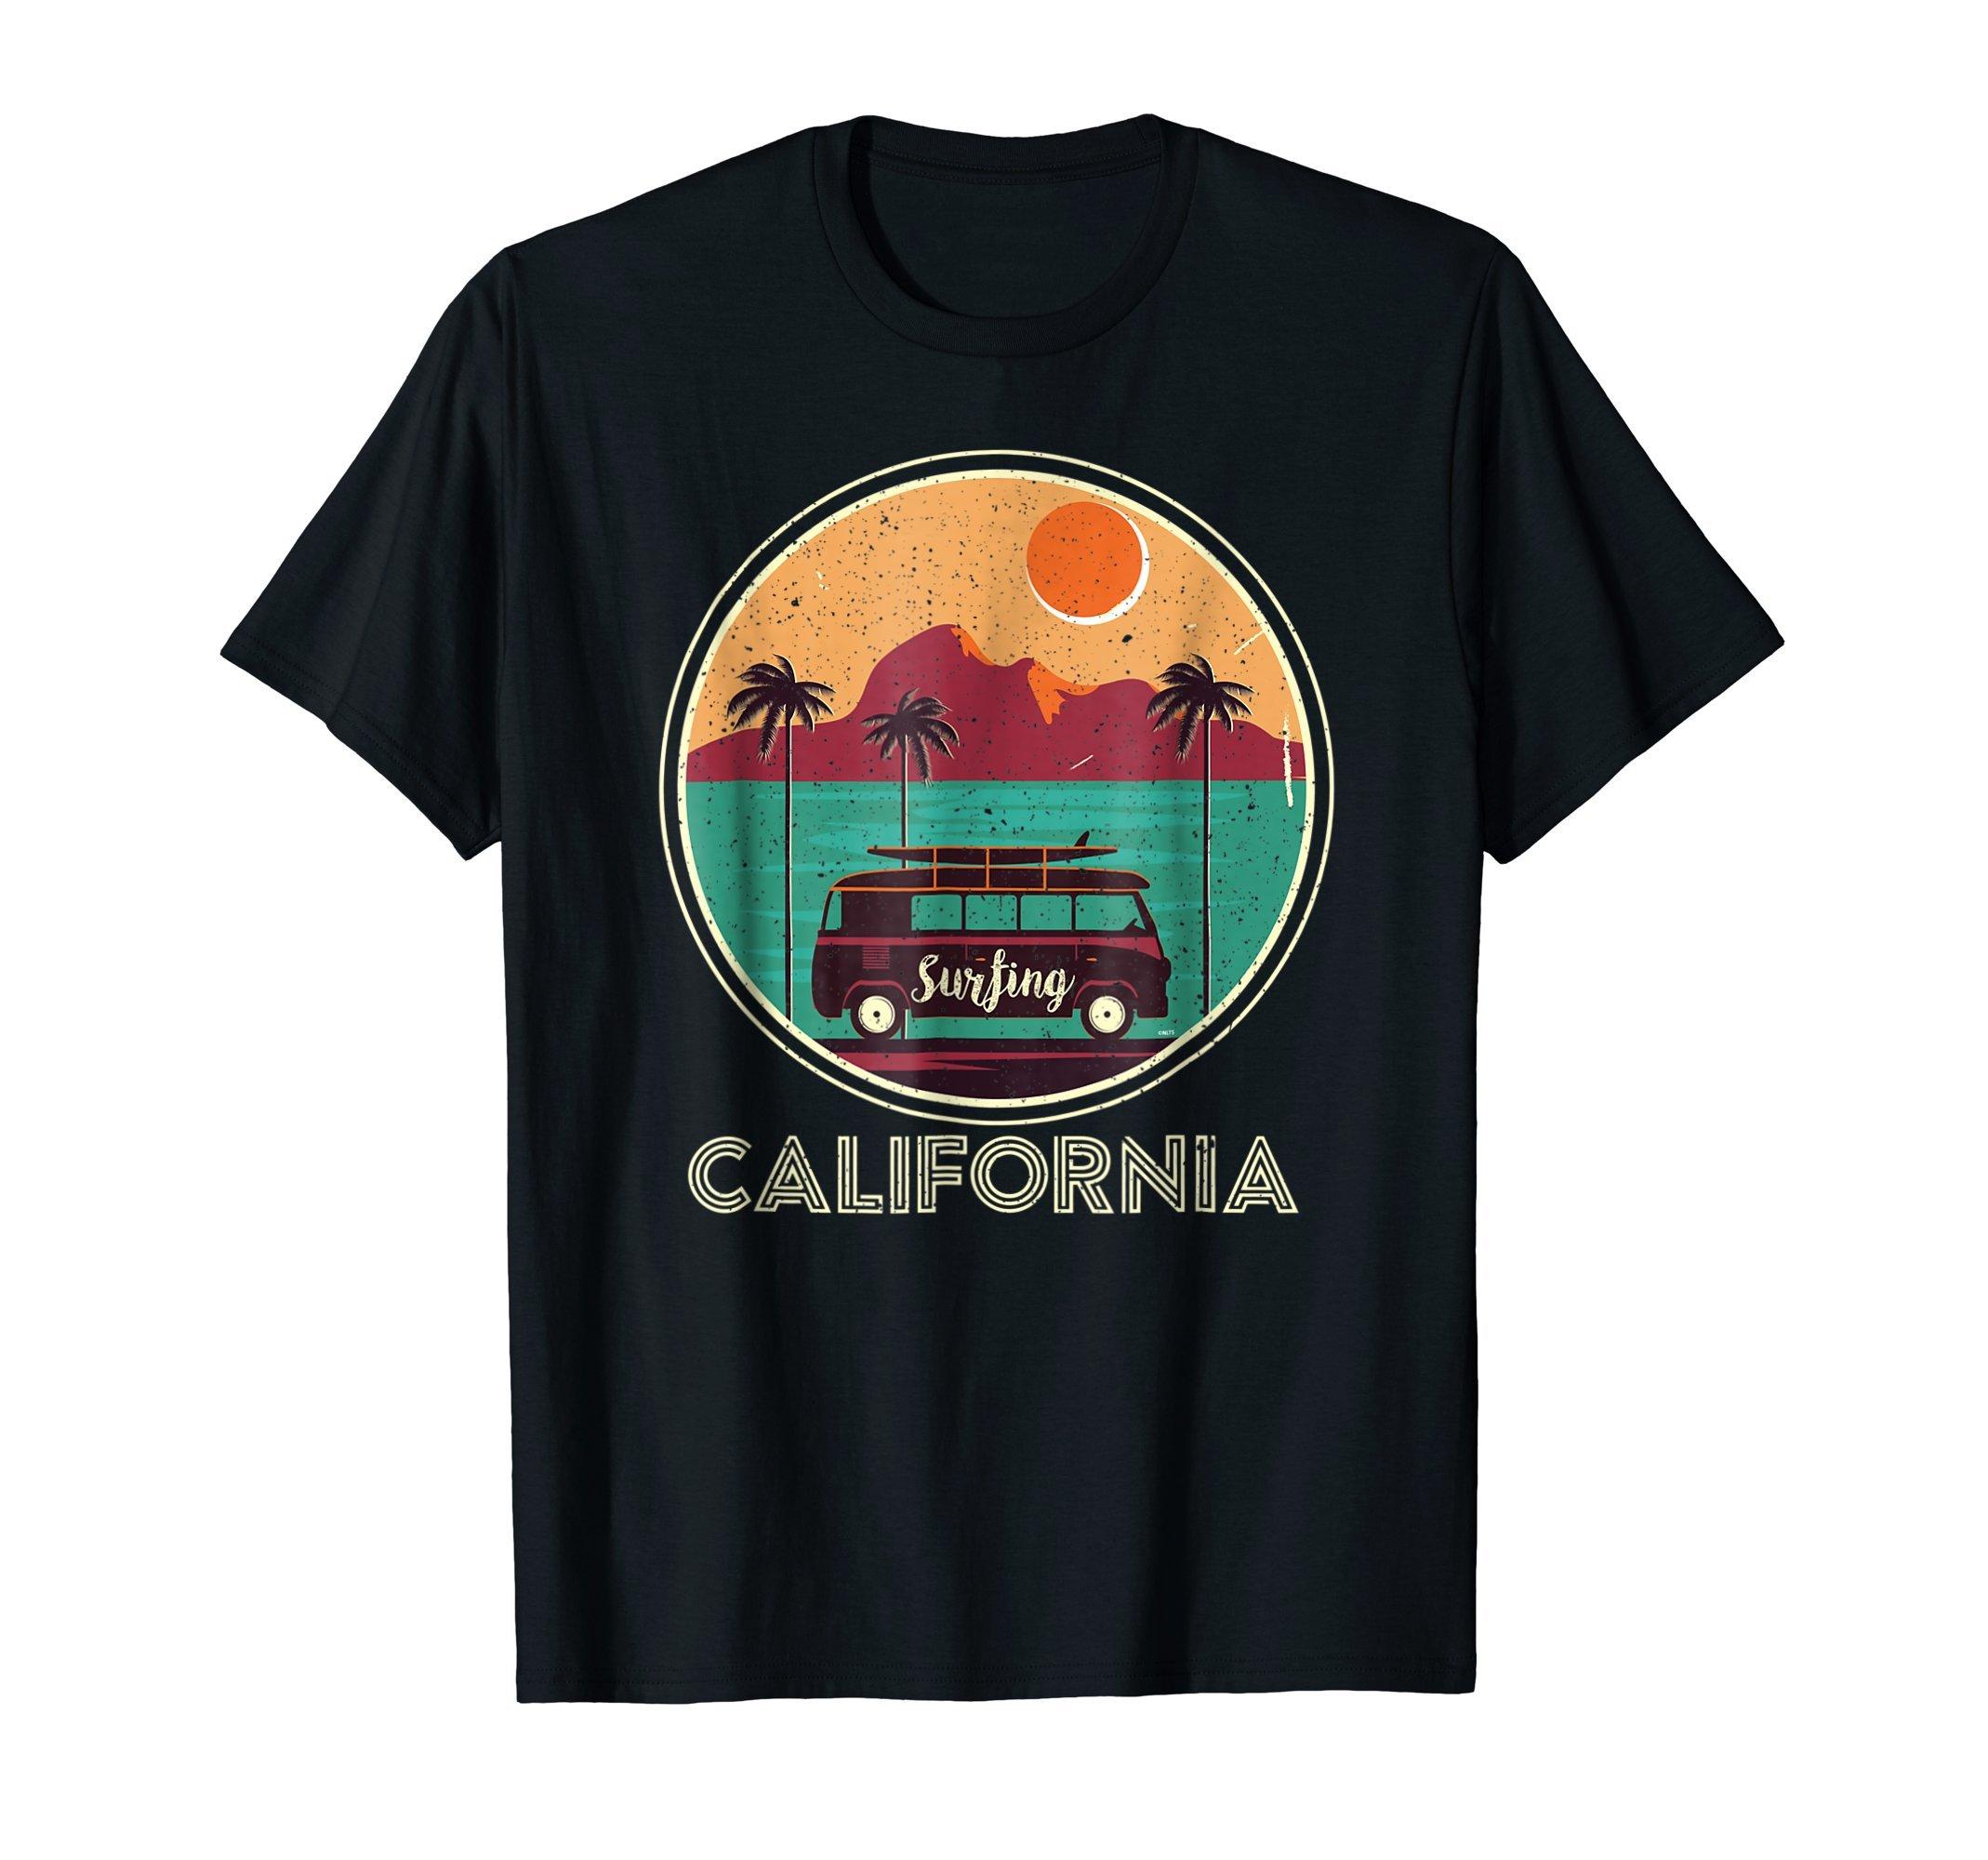 Surfing-California-Van-Retro-Vintage-T-Shirt-Gift-Tee-Shirt